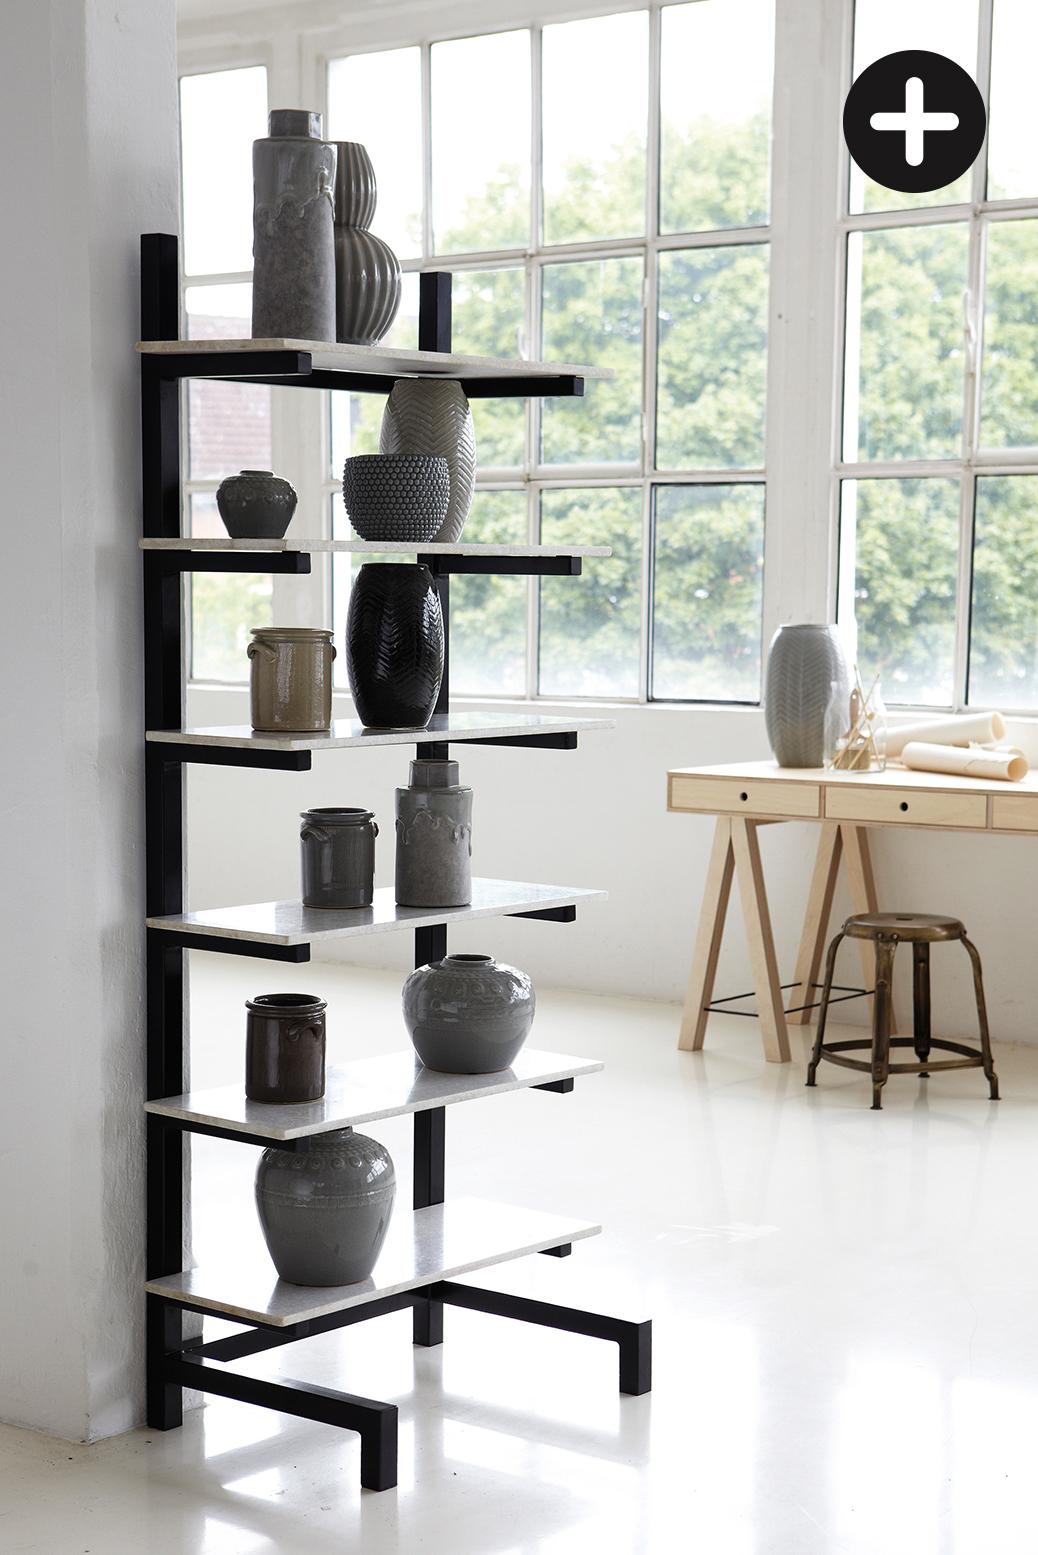 Interior vitamins by House Doctor: EASY shelf rack